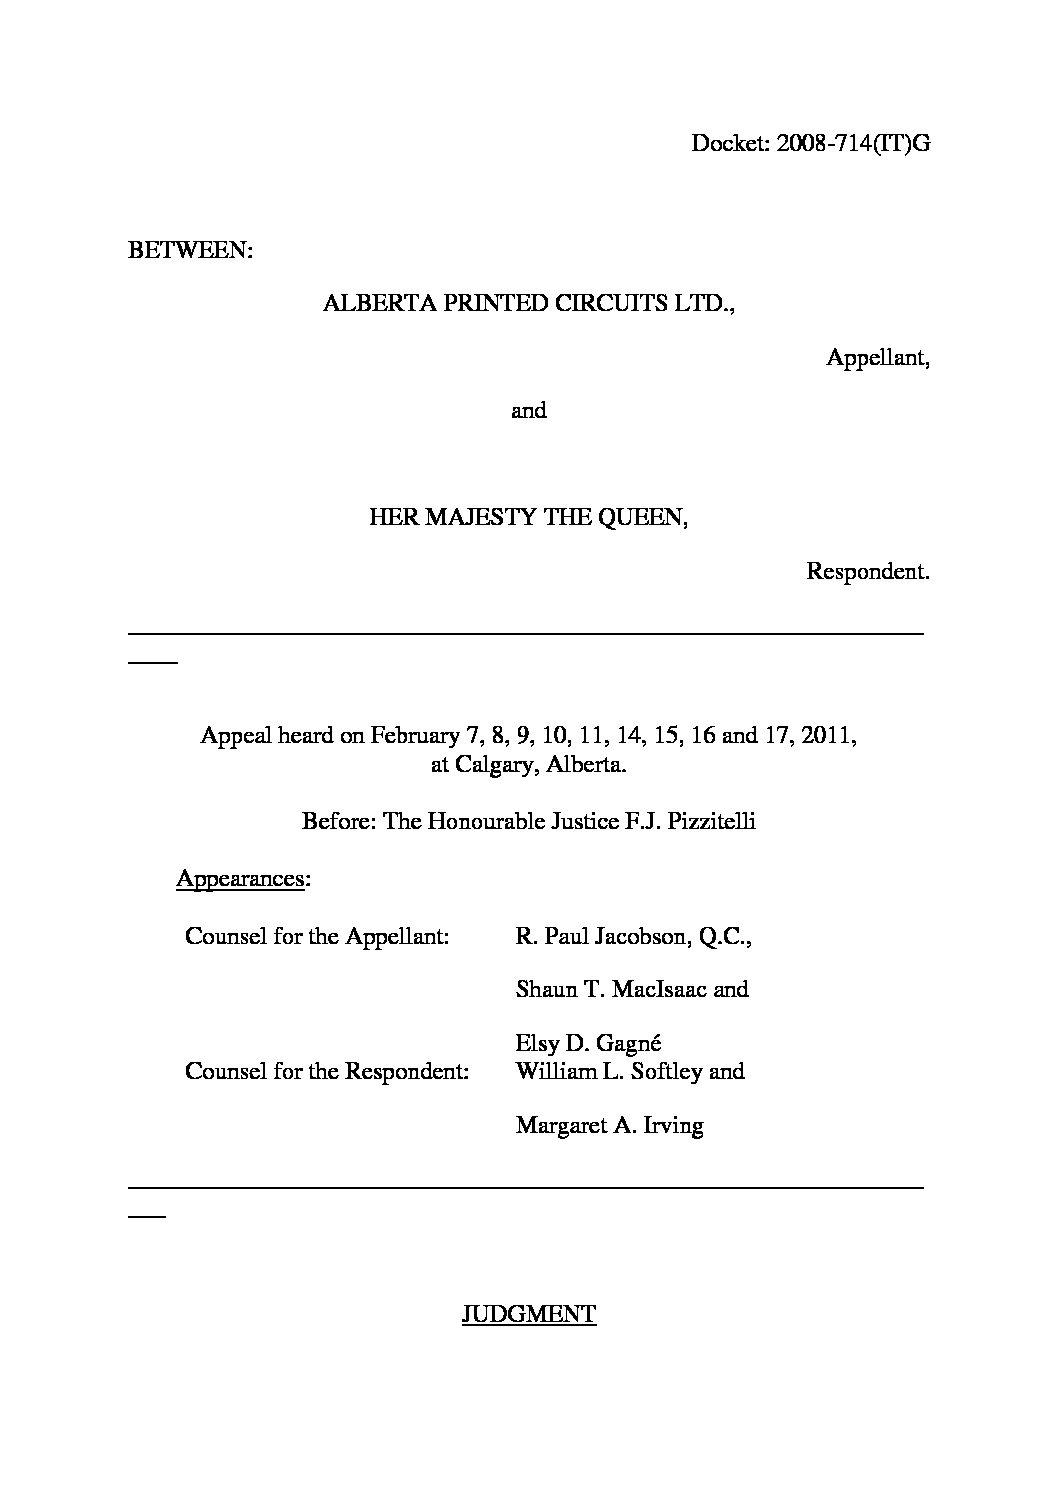 Bundled transactions - transfer pricing case law at - TPcases com